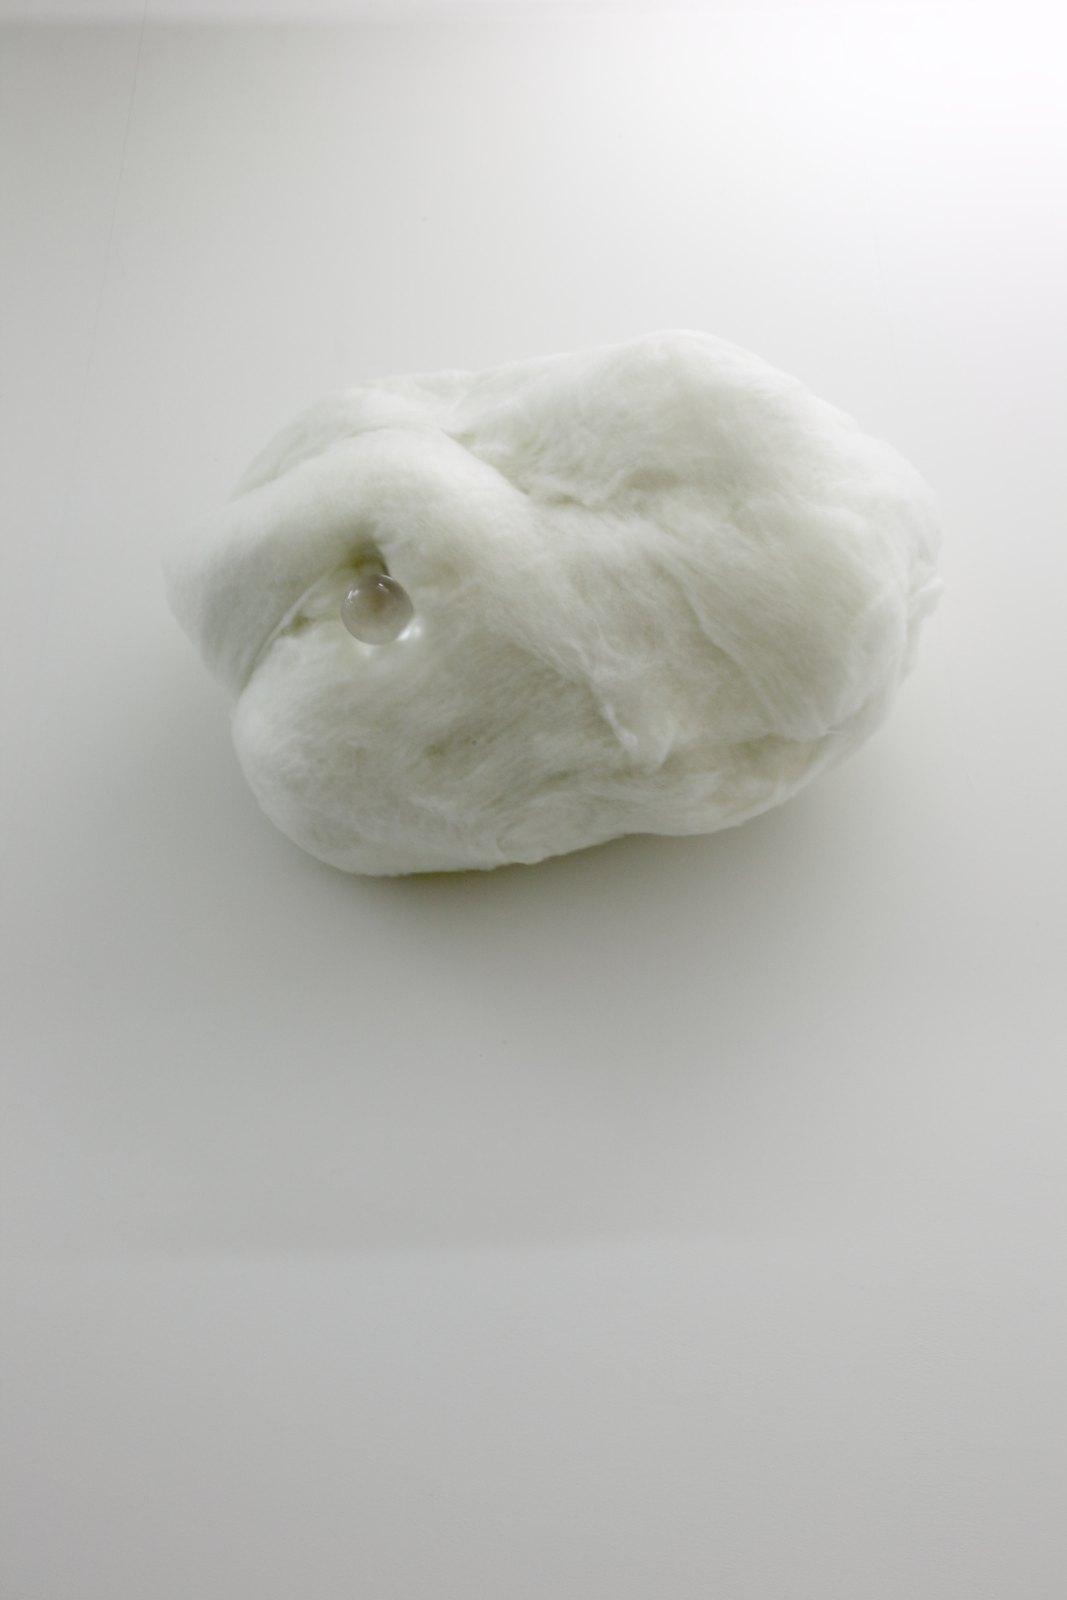 Marijke van Warmerdam, first Drop, 2004, cotton, acrylic ball, metal, 70 x 93 x 43 cm